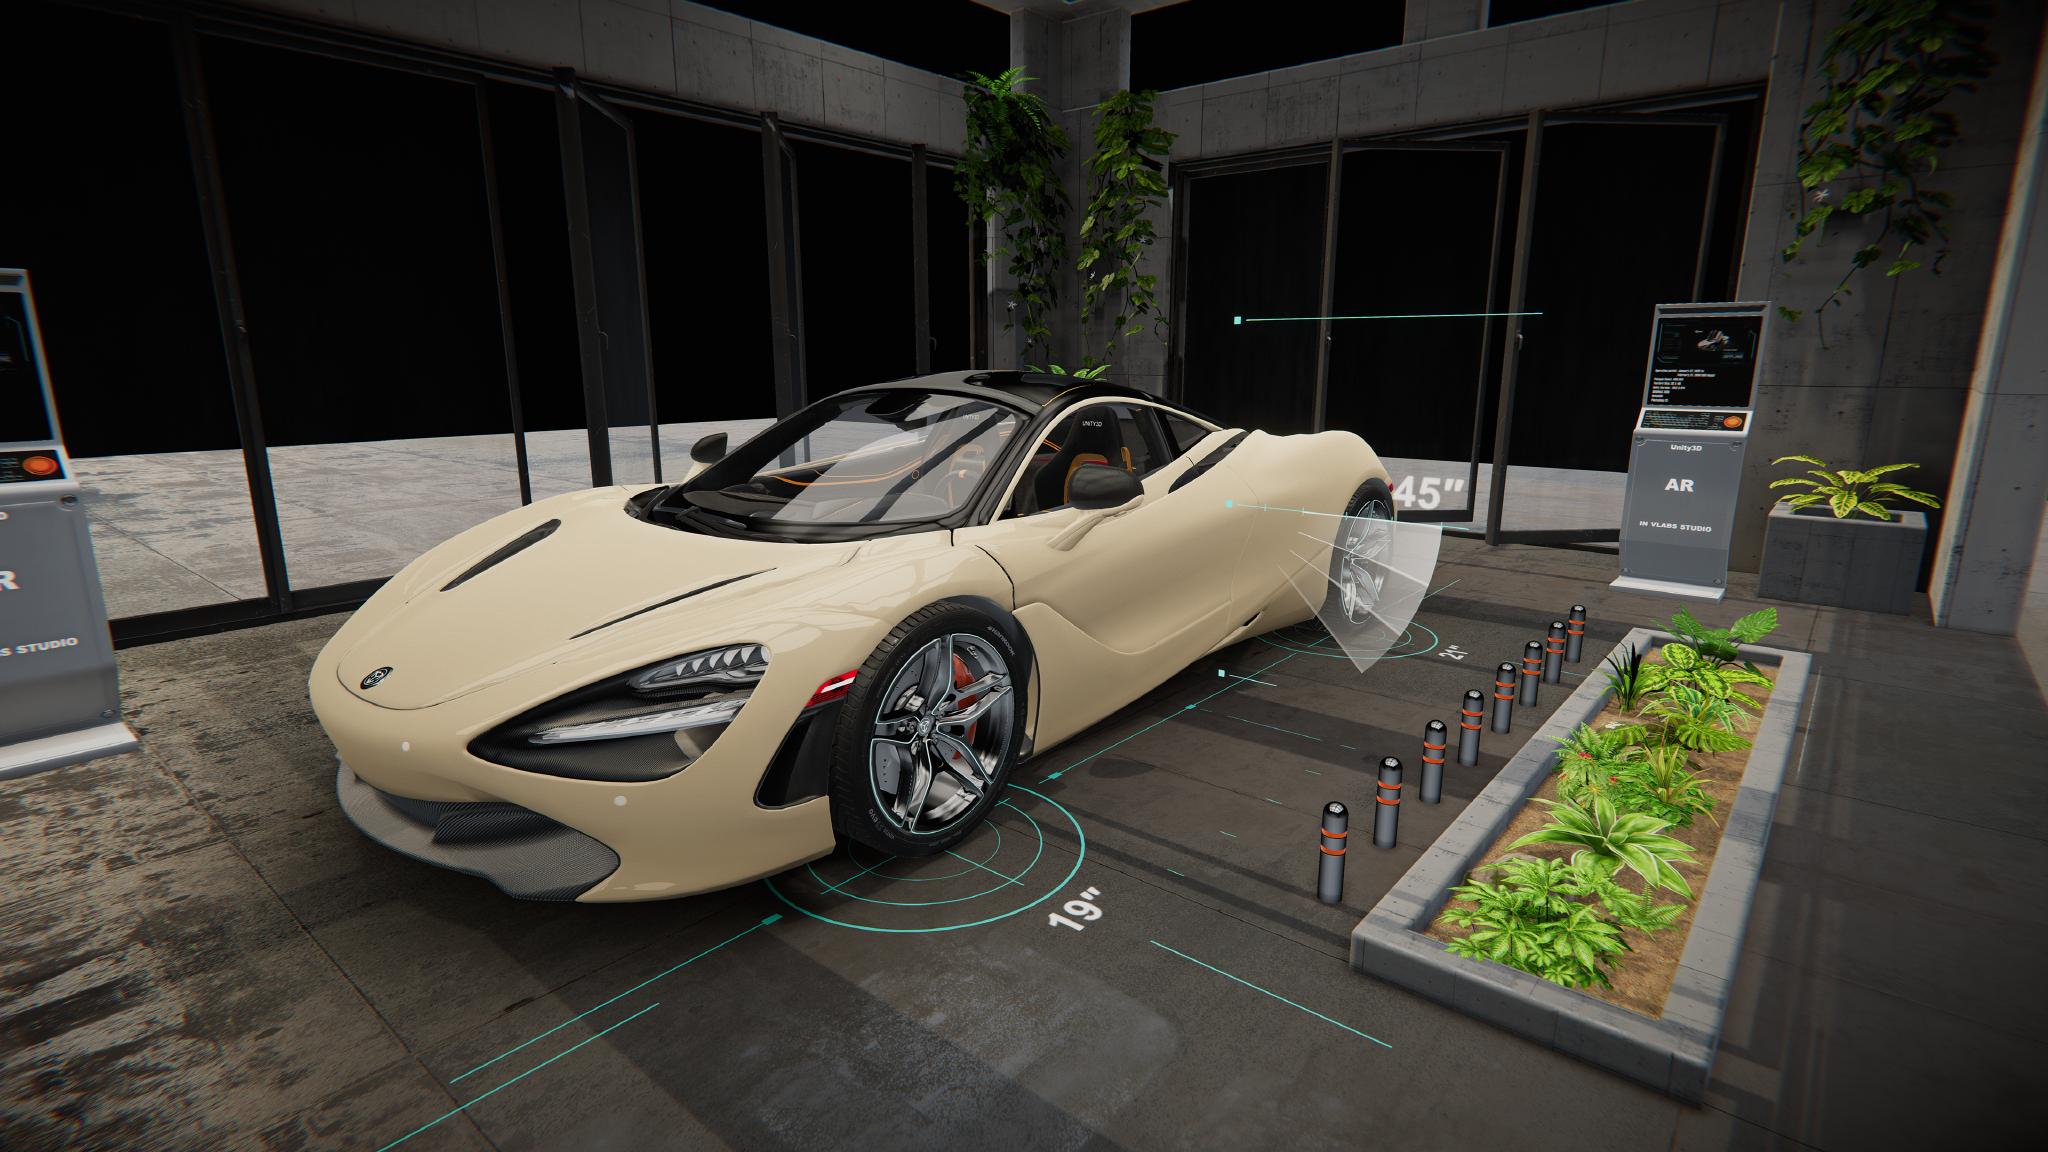 2019 Mclaren 720S AR Unity3D Work